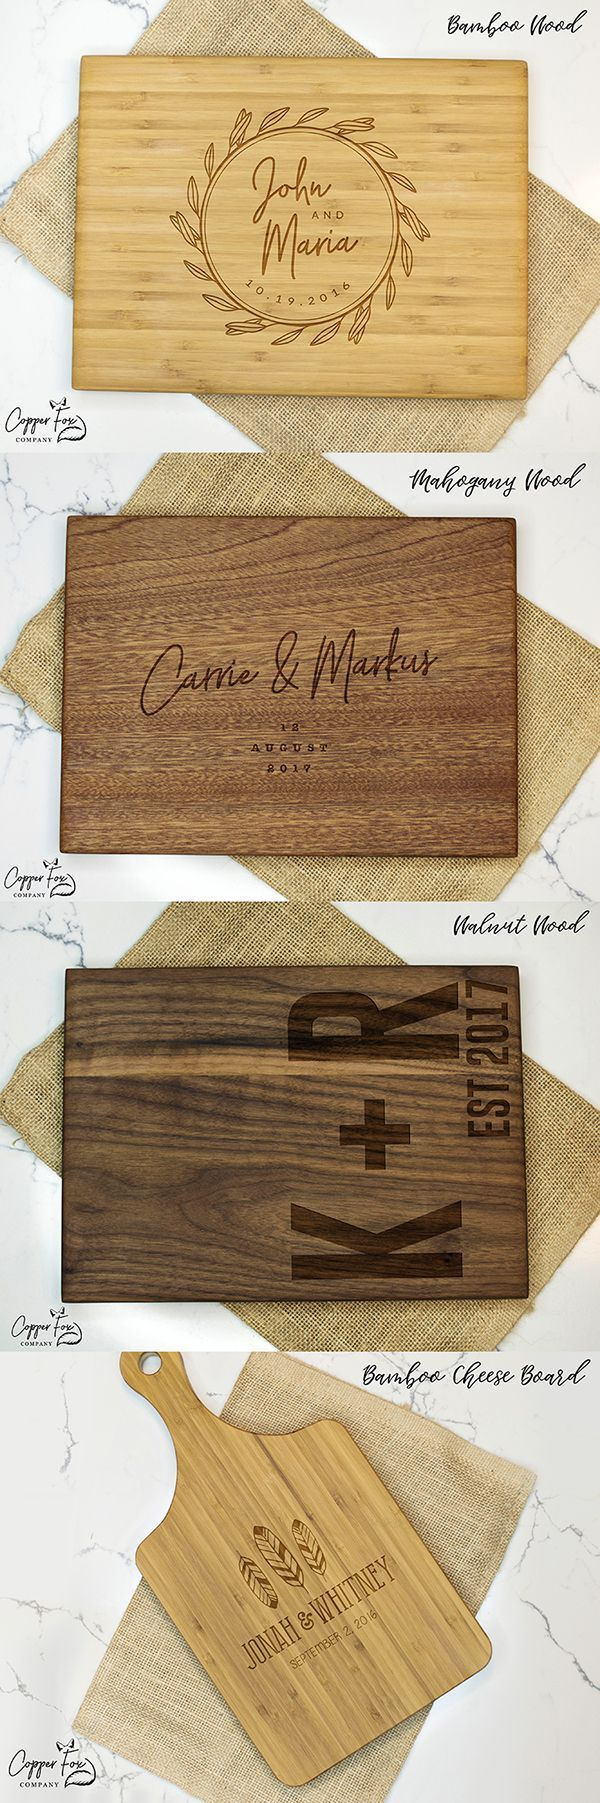 personalized cutting boards etsy, custom cutting board, wedding gift for bride a…